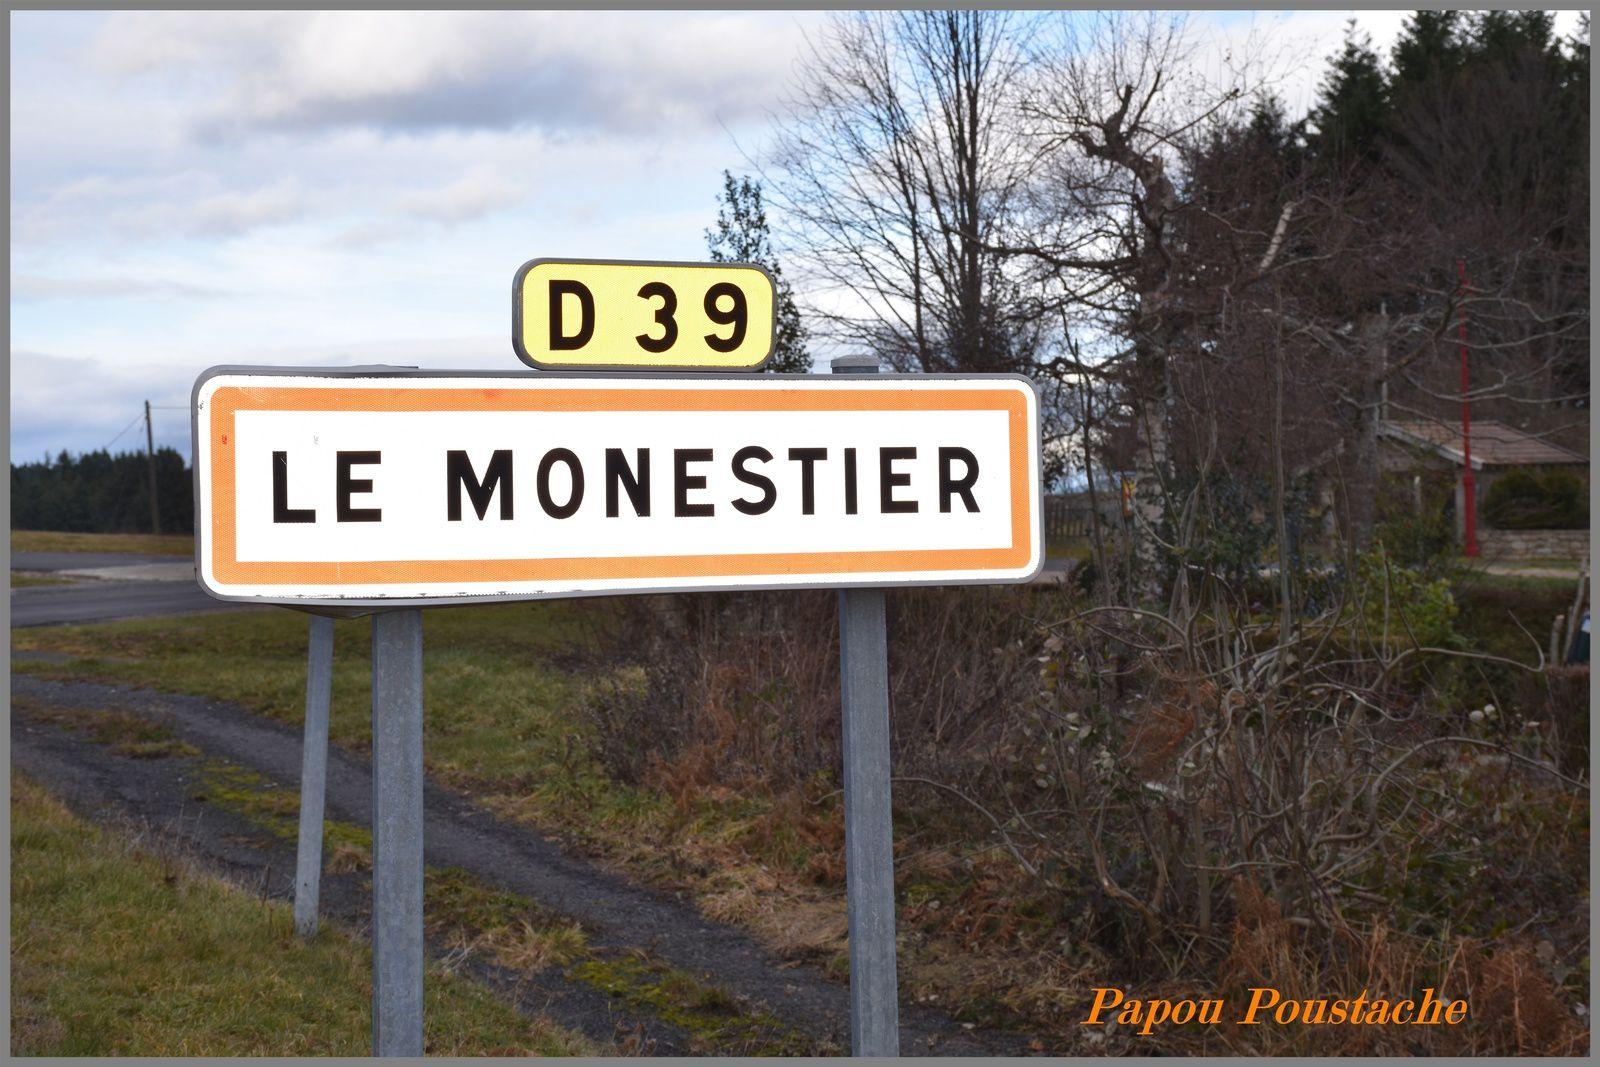 Le Monestier